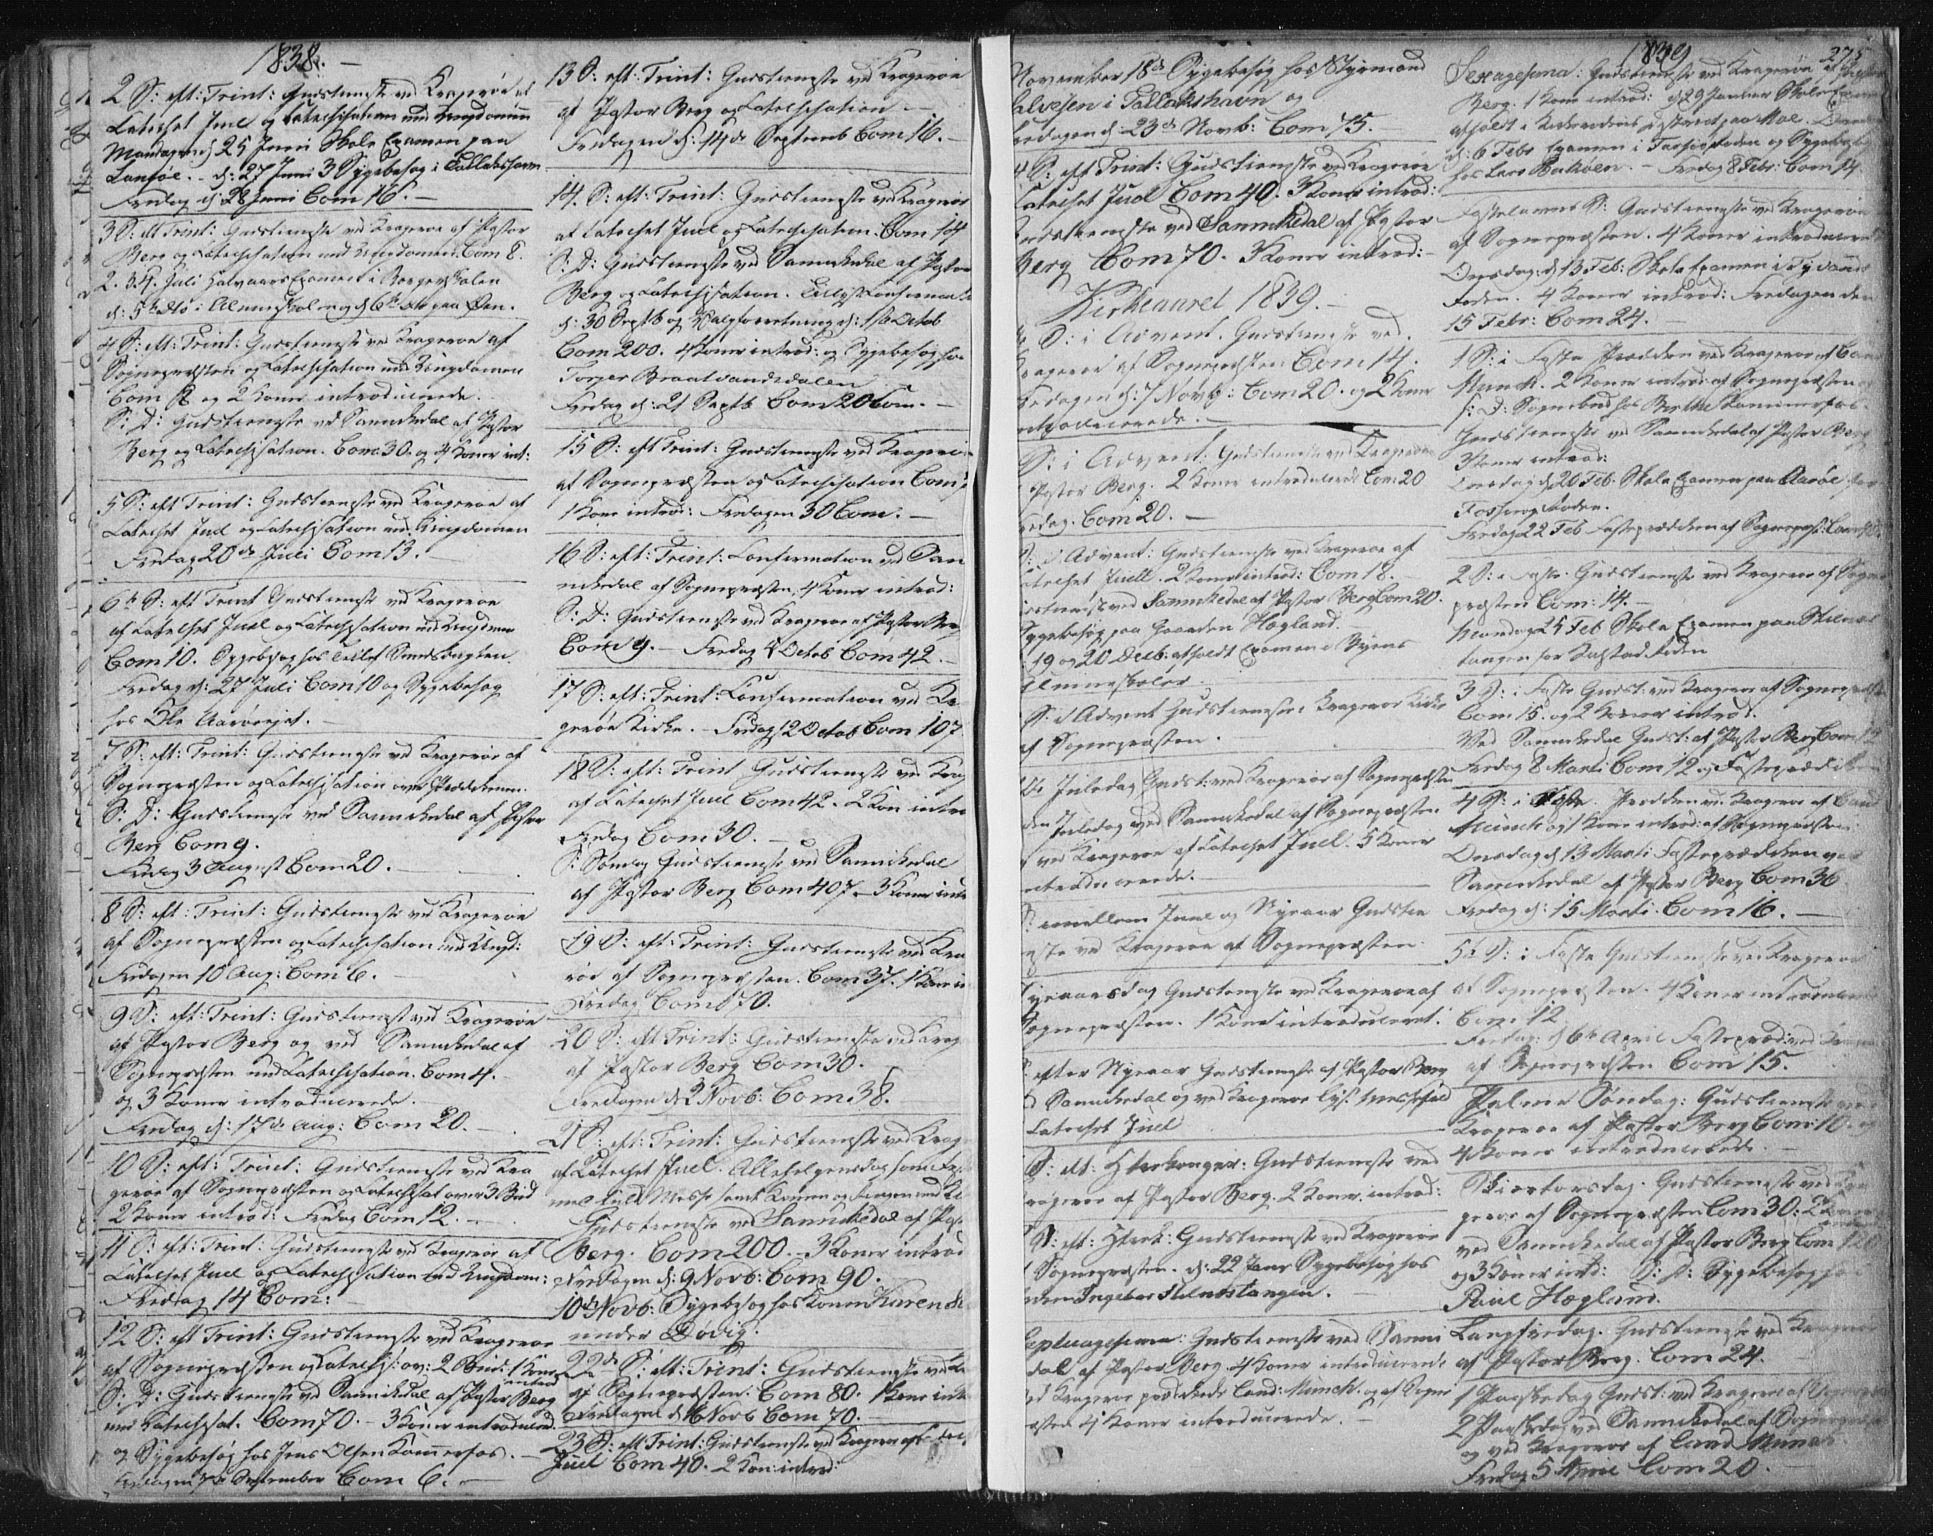 SAKO, Kragerø kirkebøker, F/Fa/L0005: Ministerialbok nr. 5, 1832-1847, s. 275